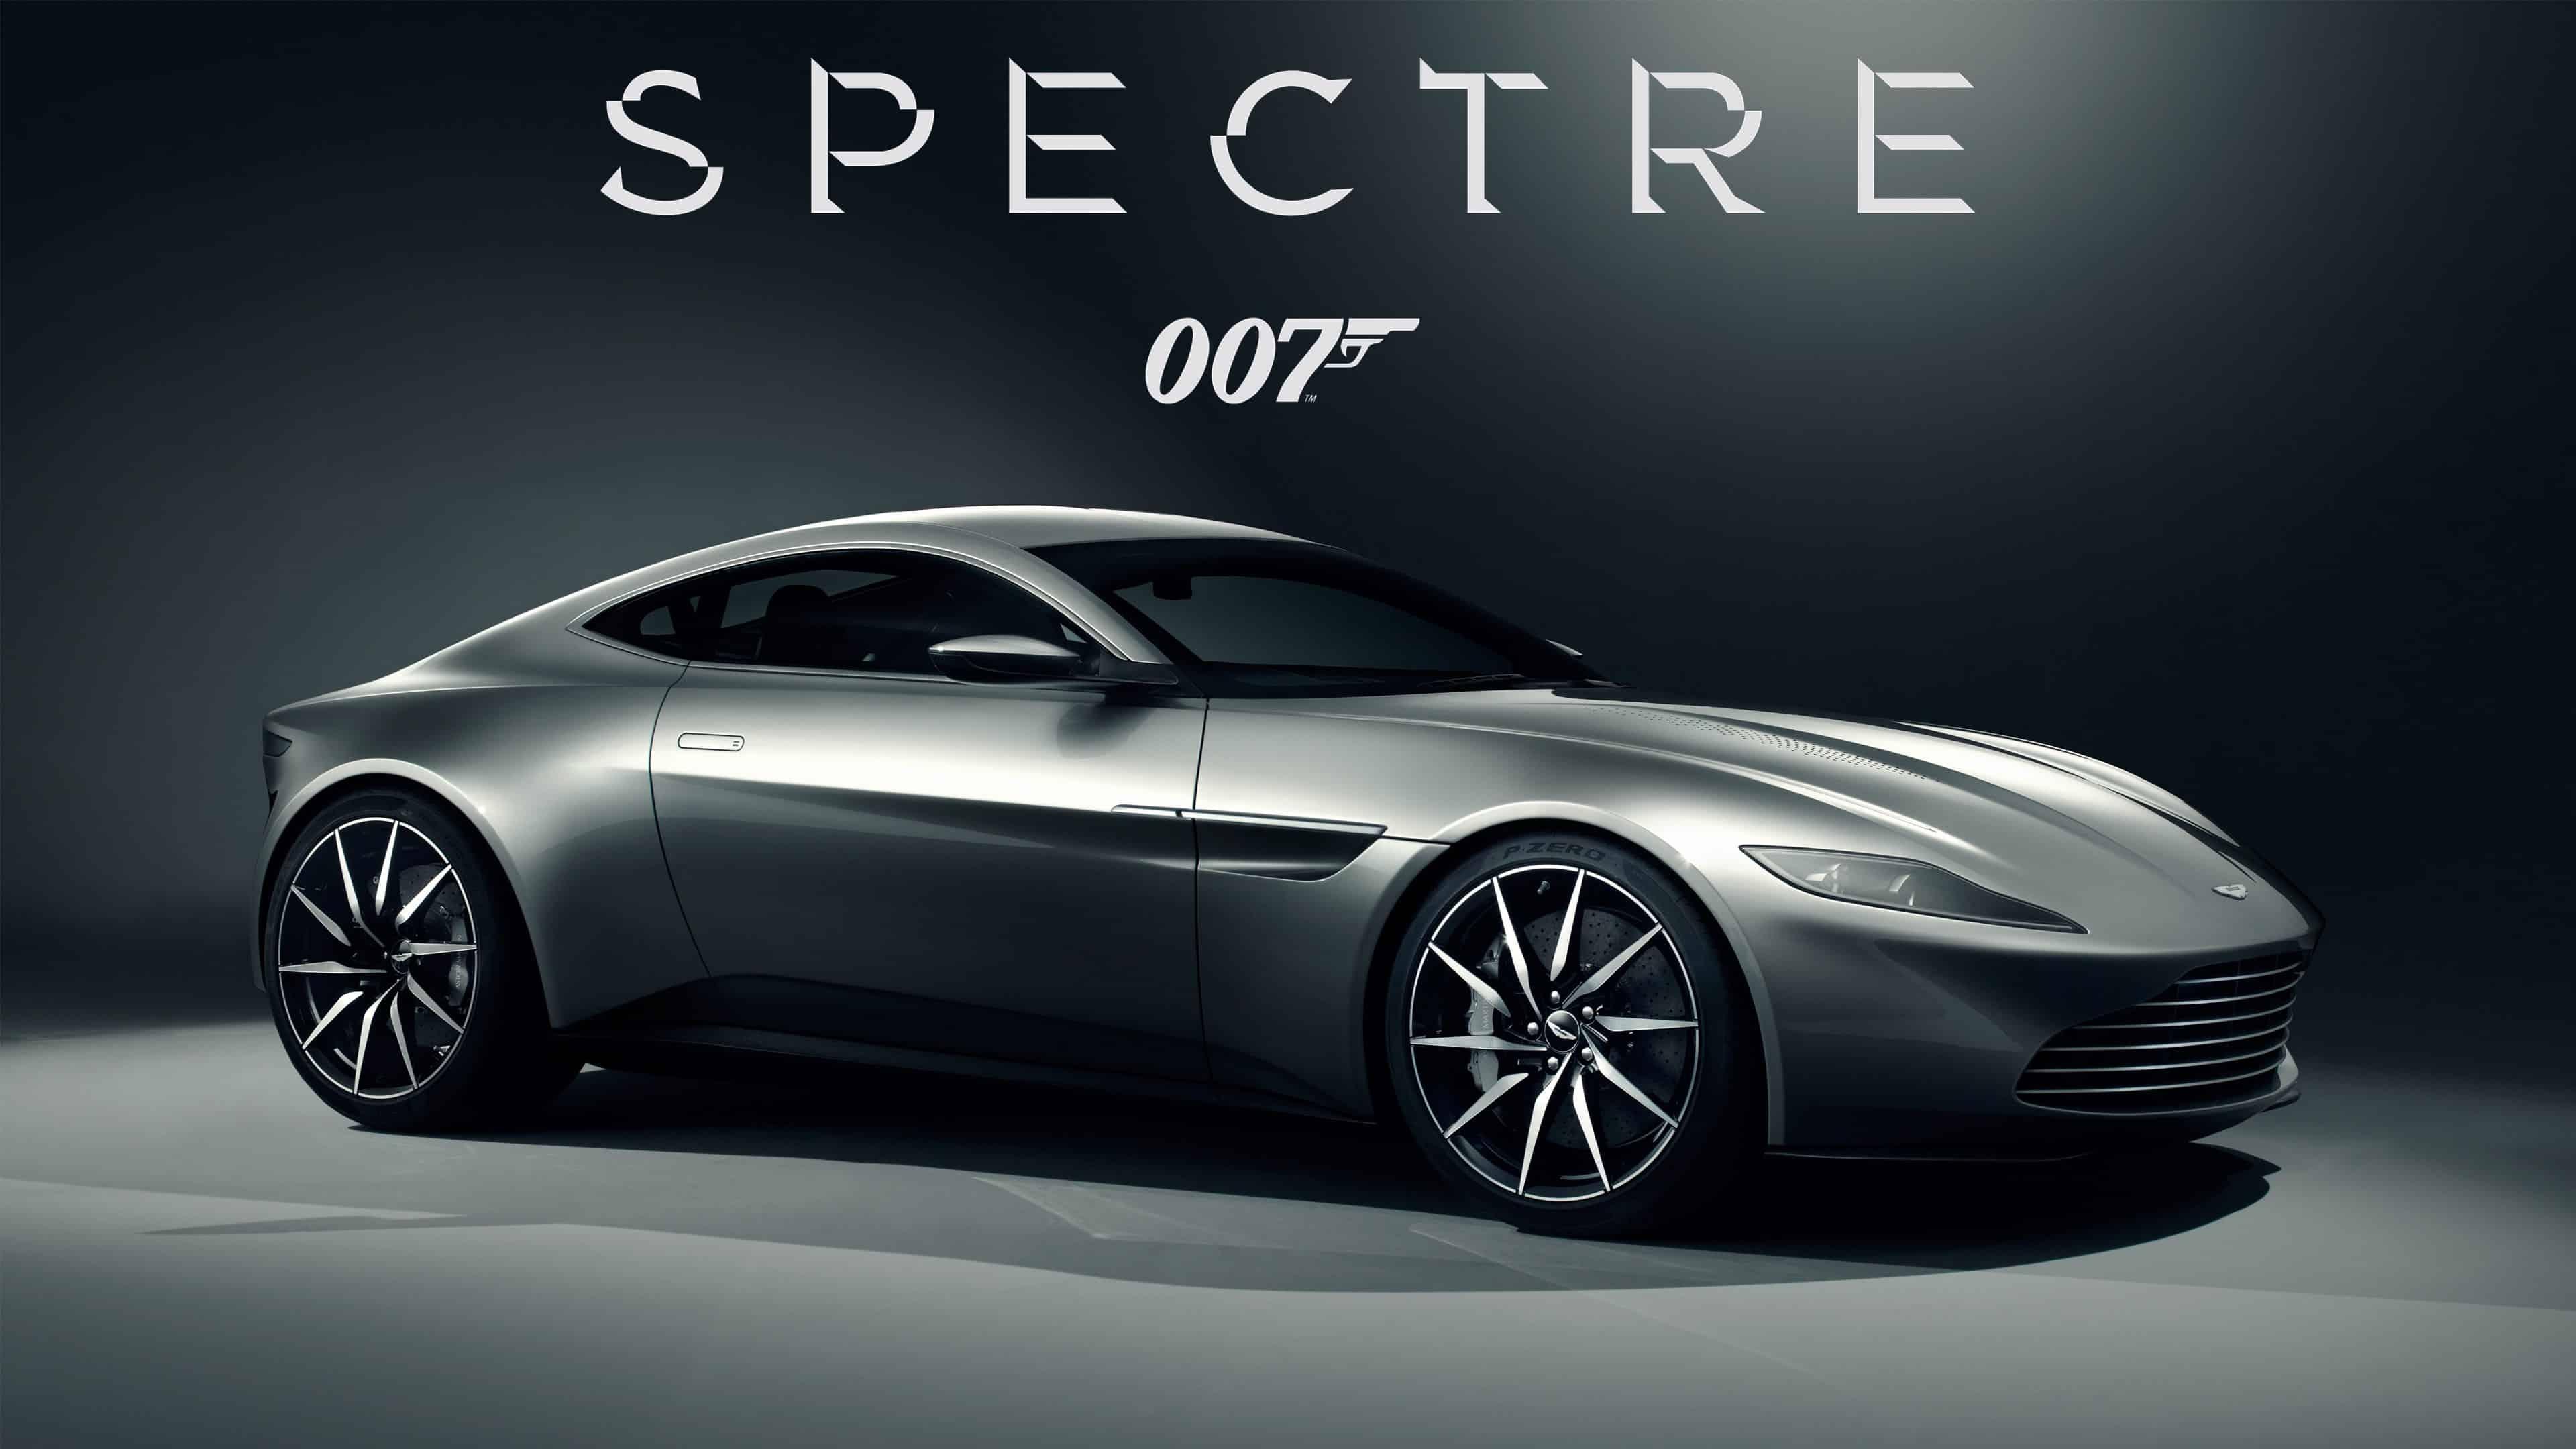 Aston Martin DB10 James Bond 007 Spectre UHD 4K Wallpaper Pixelz 3840x2160